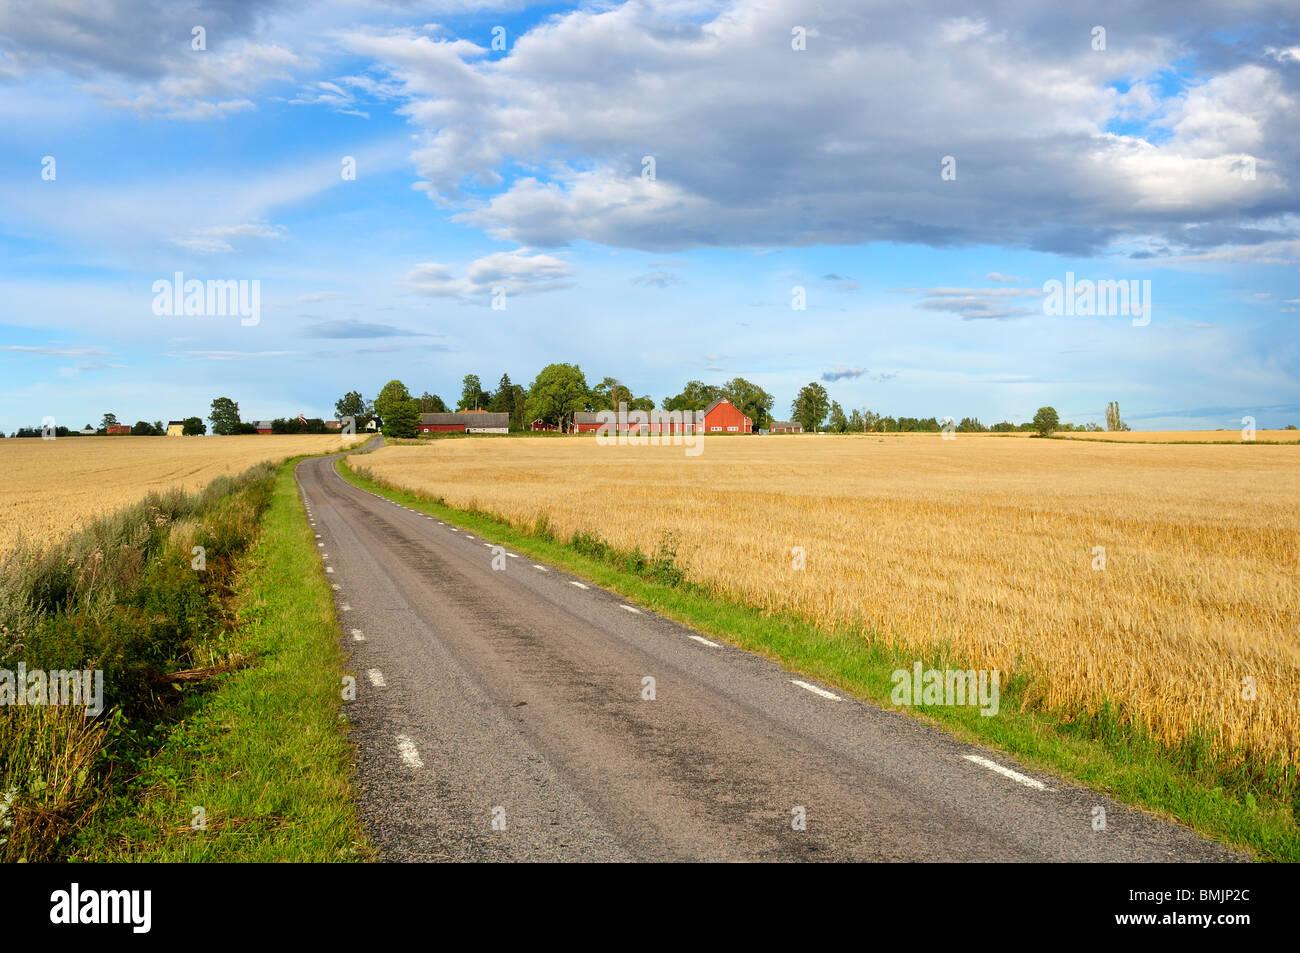 Scandinavian Peninsula, Sweden, Ostergotland, View of empty road passing through field - Stock Image